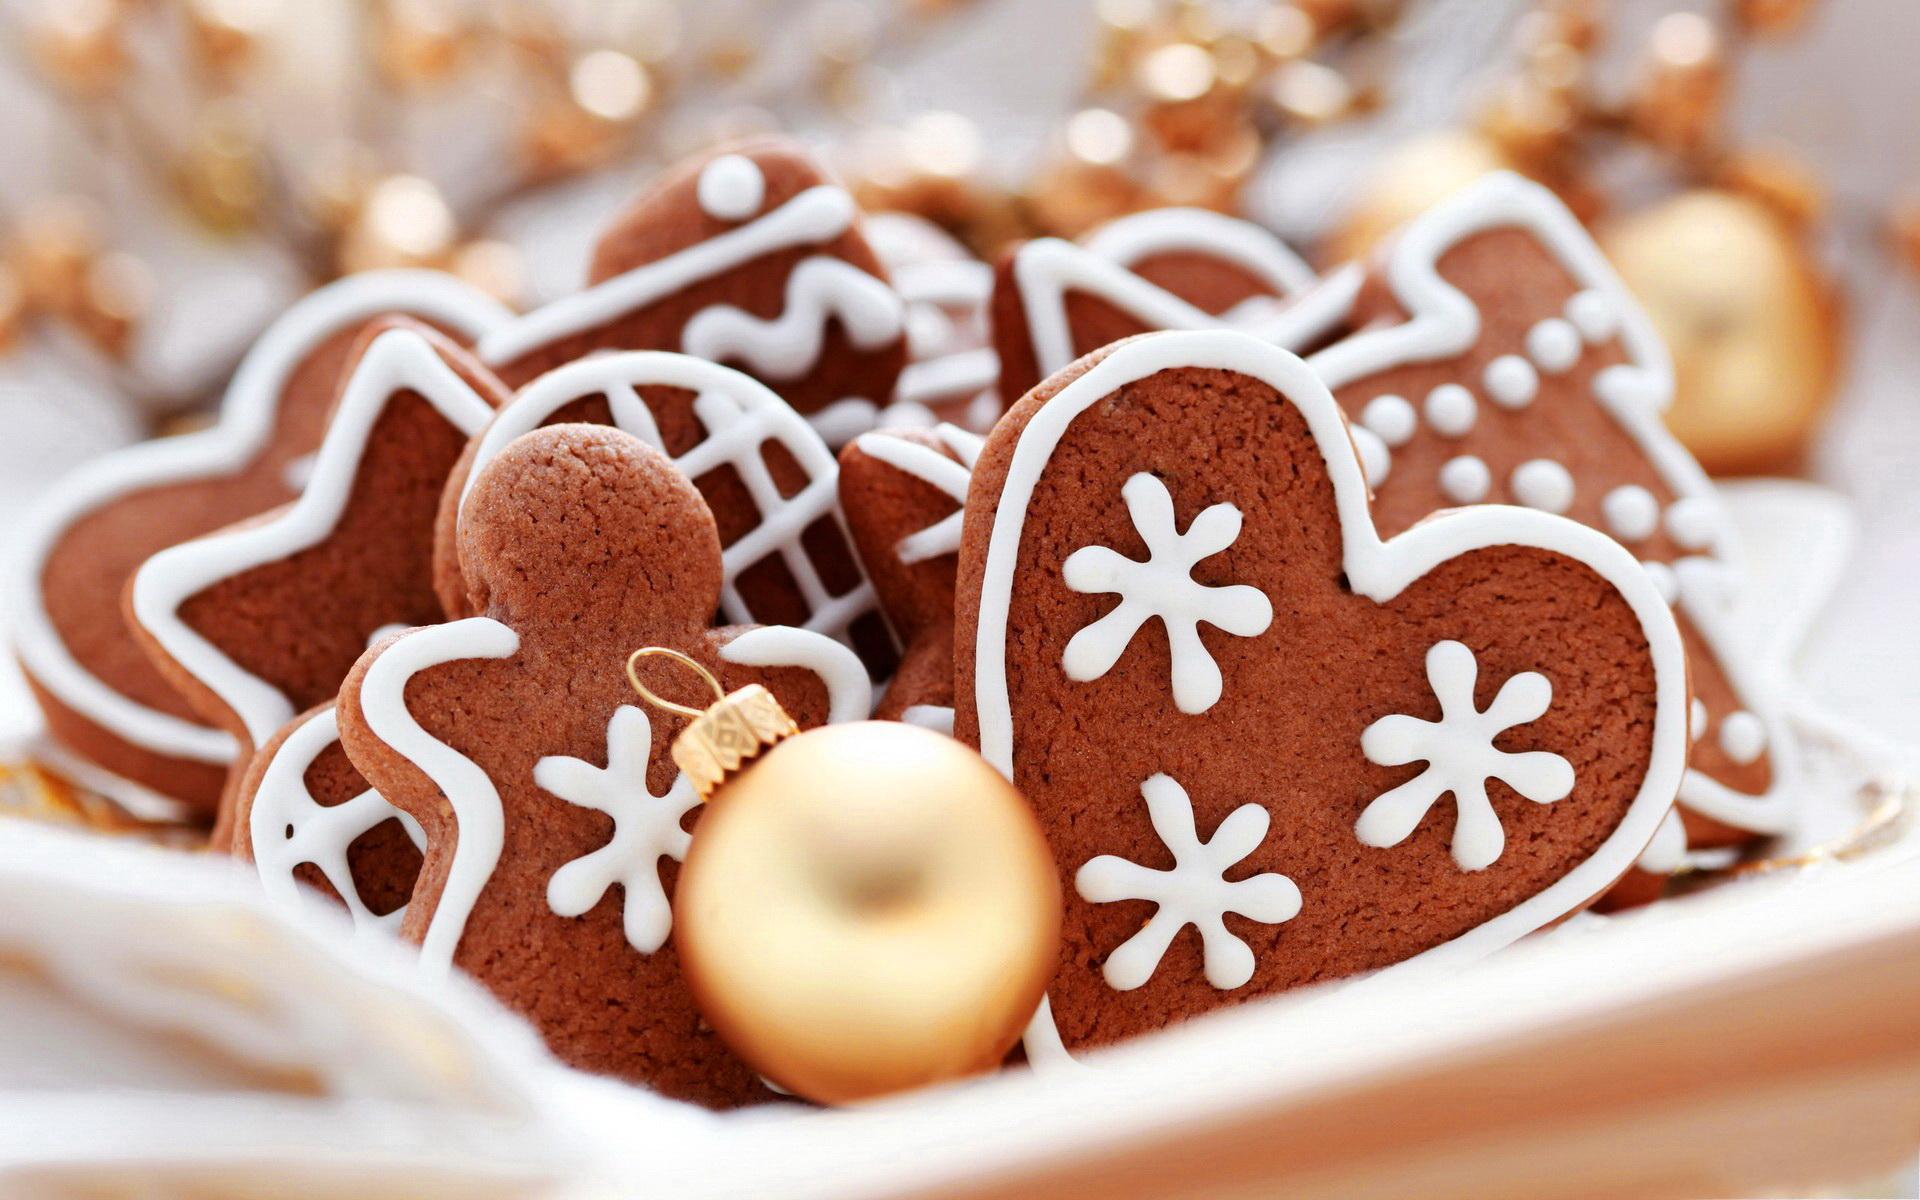 Christmas Cookies Wallpapers - Wallpaper Cave